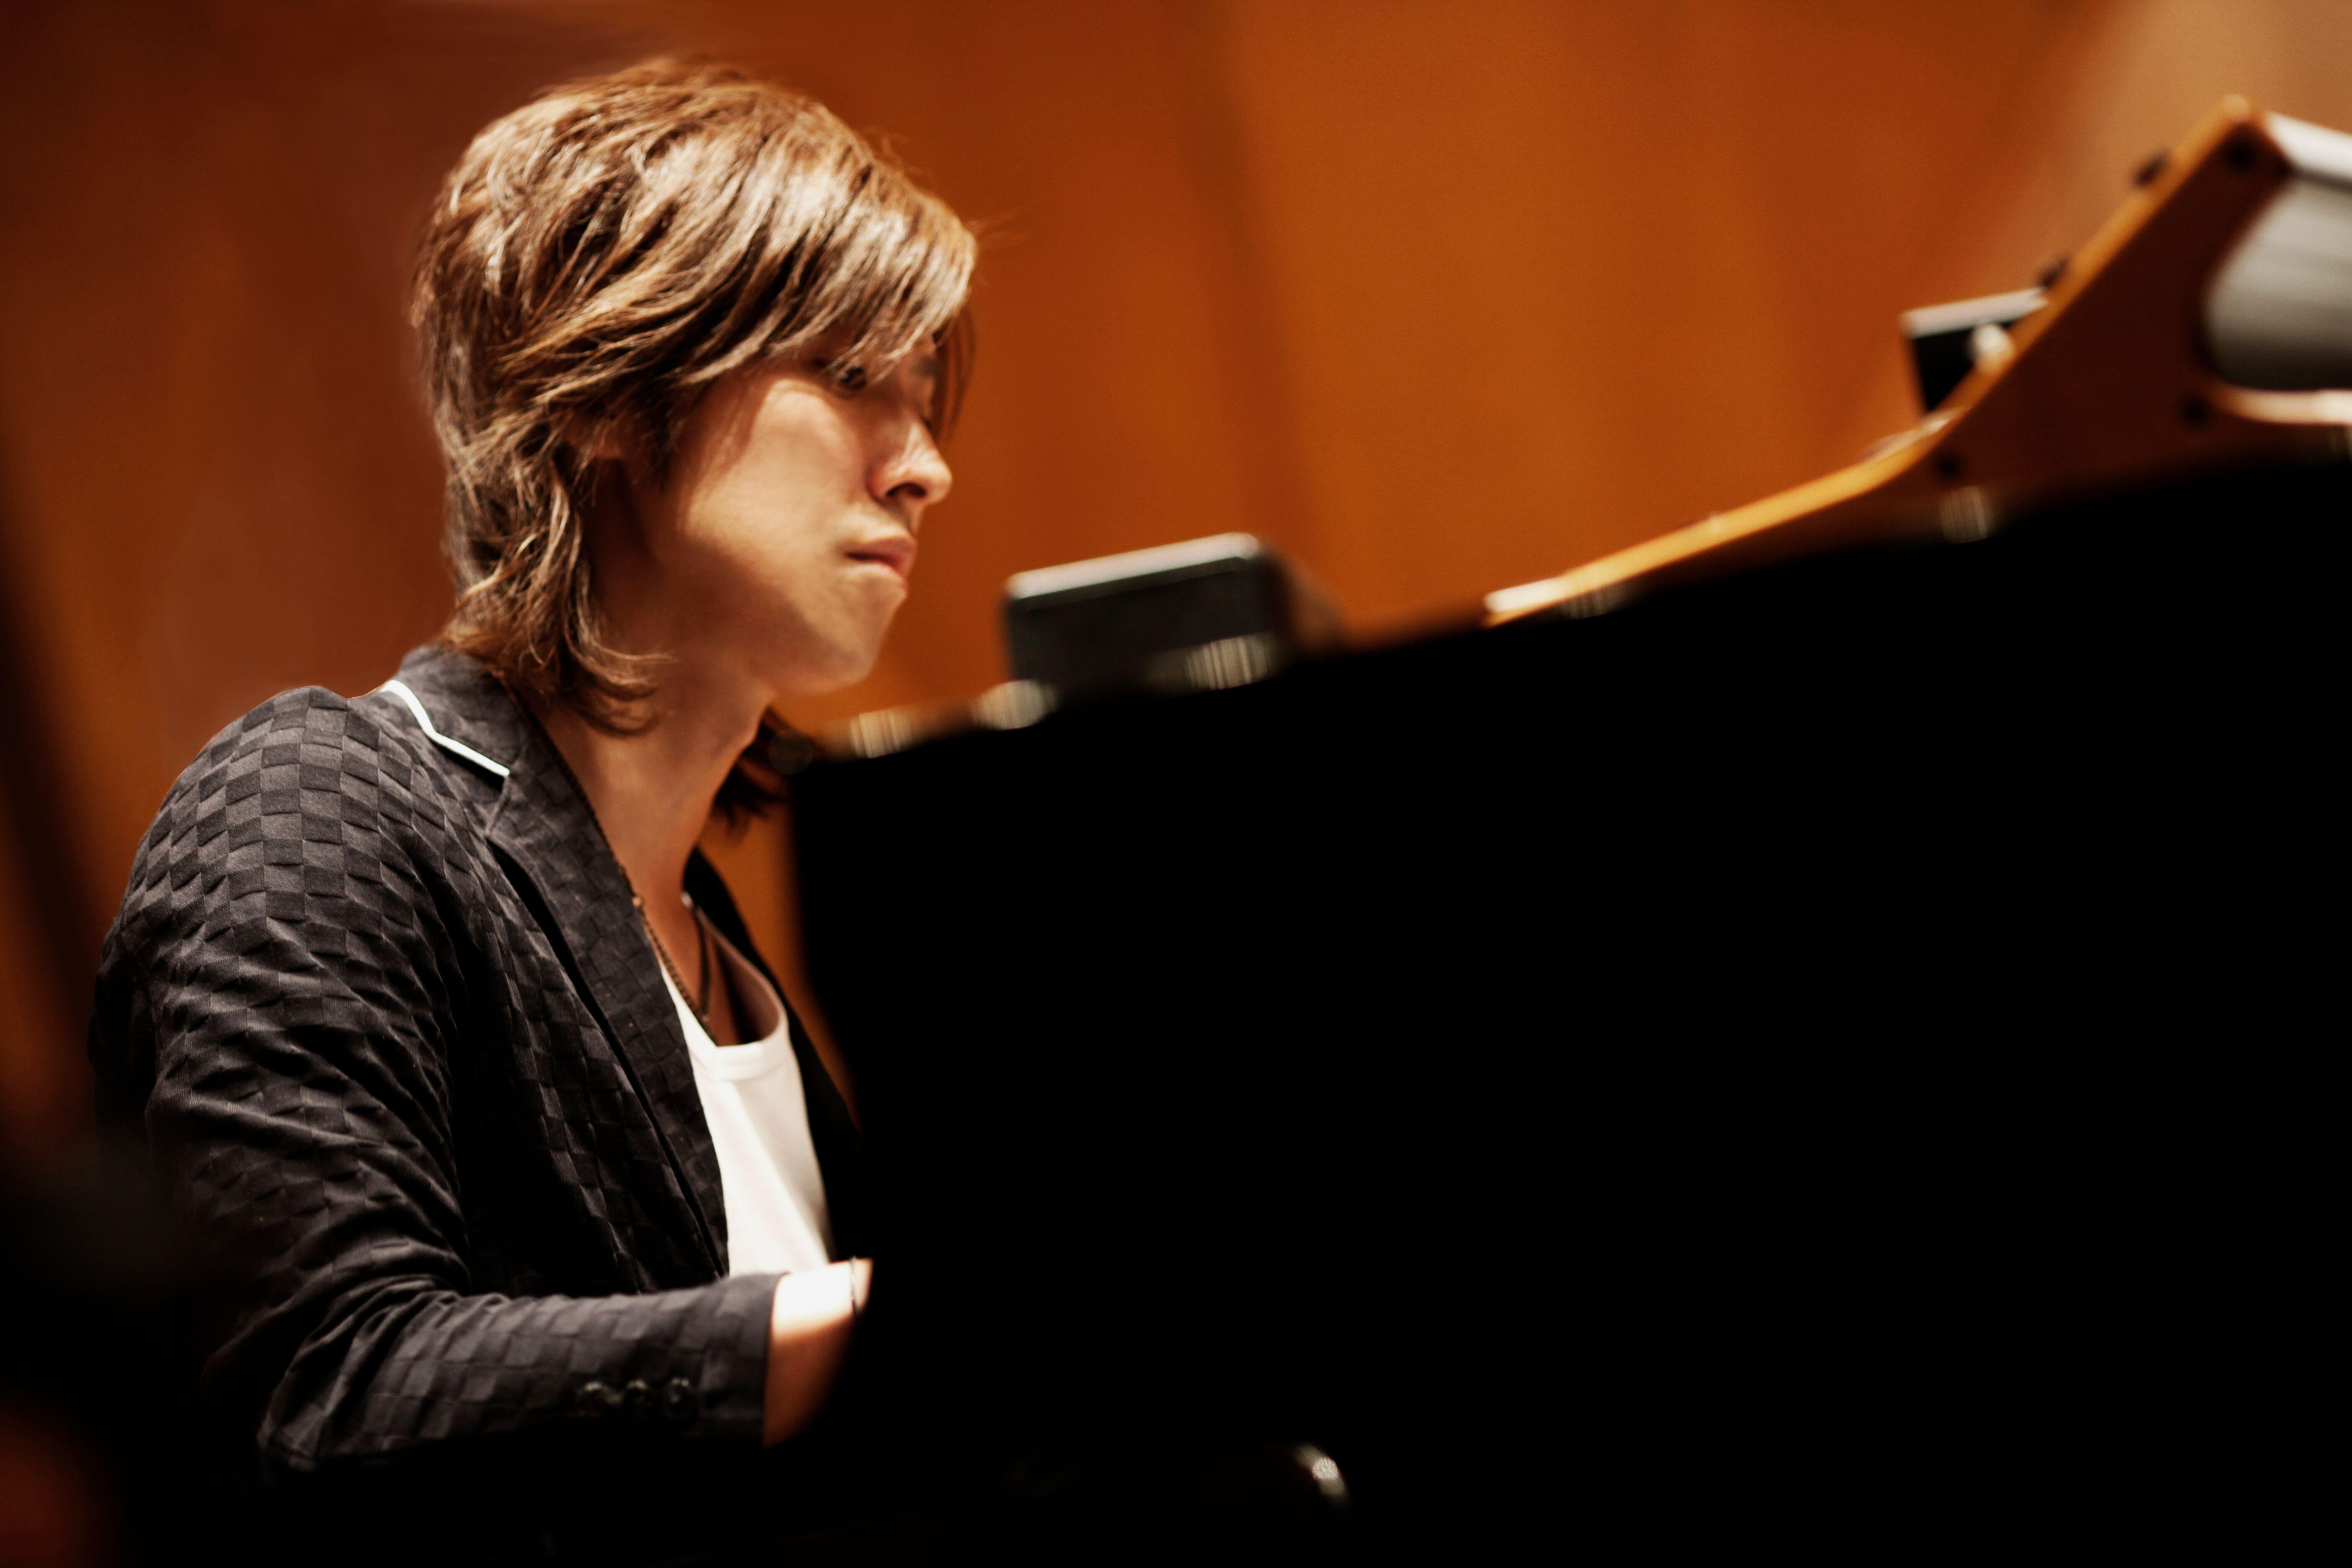 Hakuei Kim Solo Piano Concert